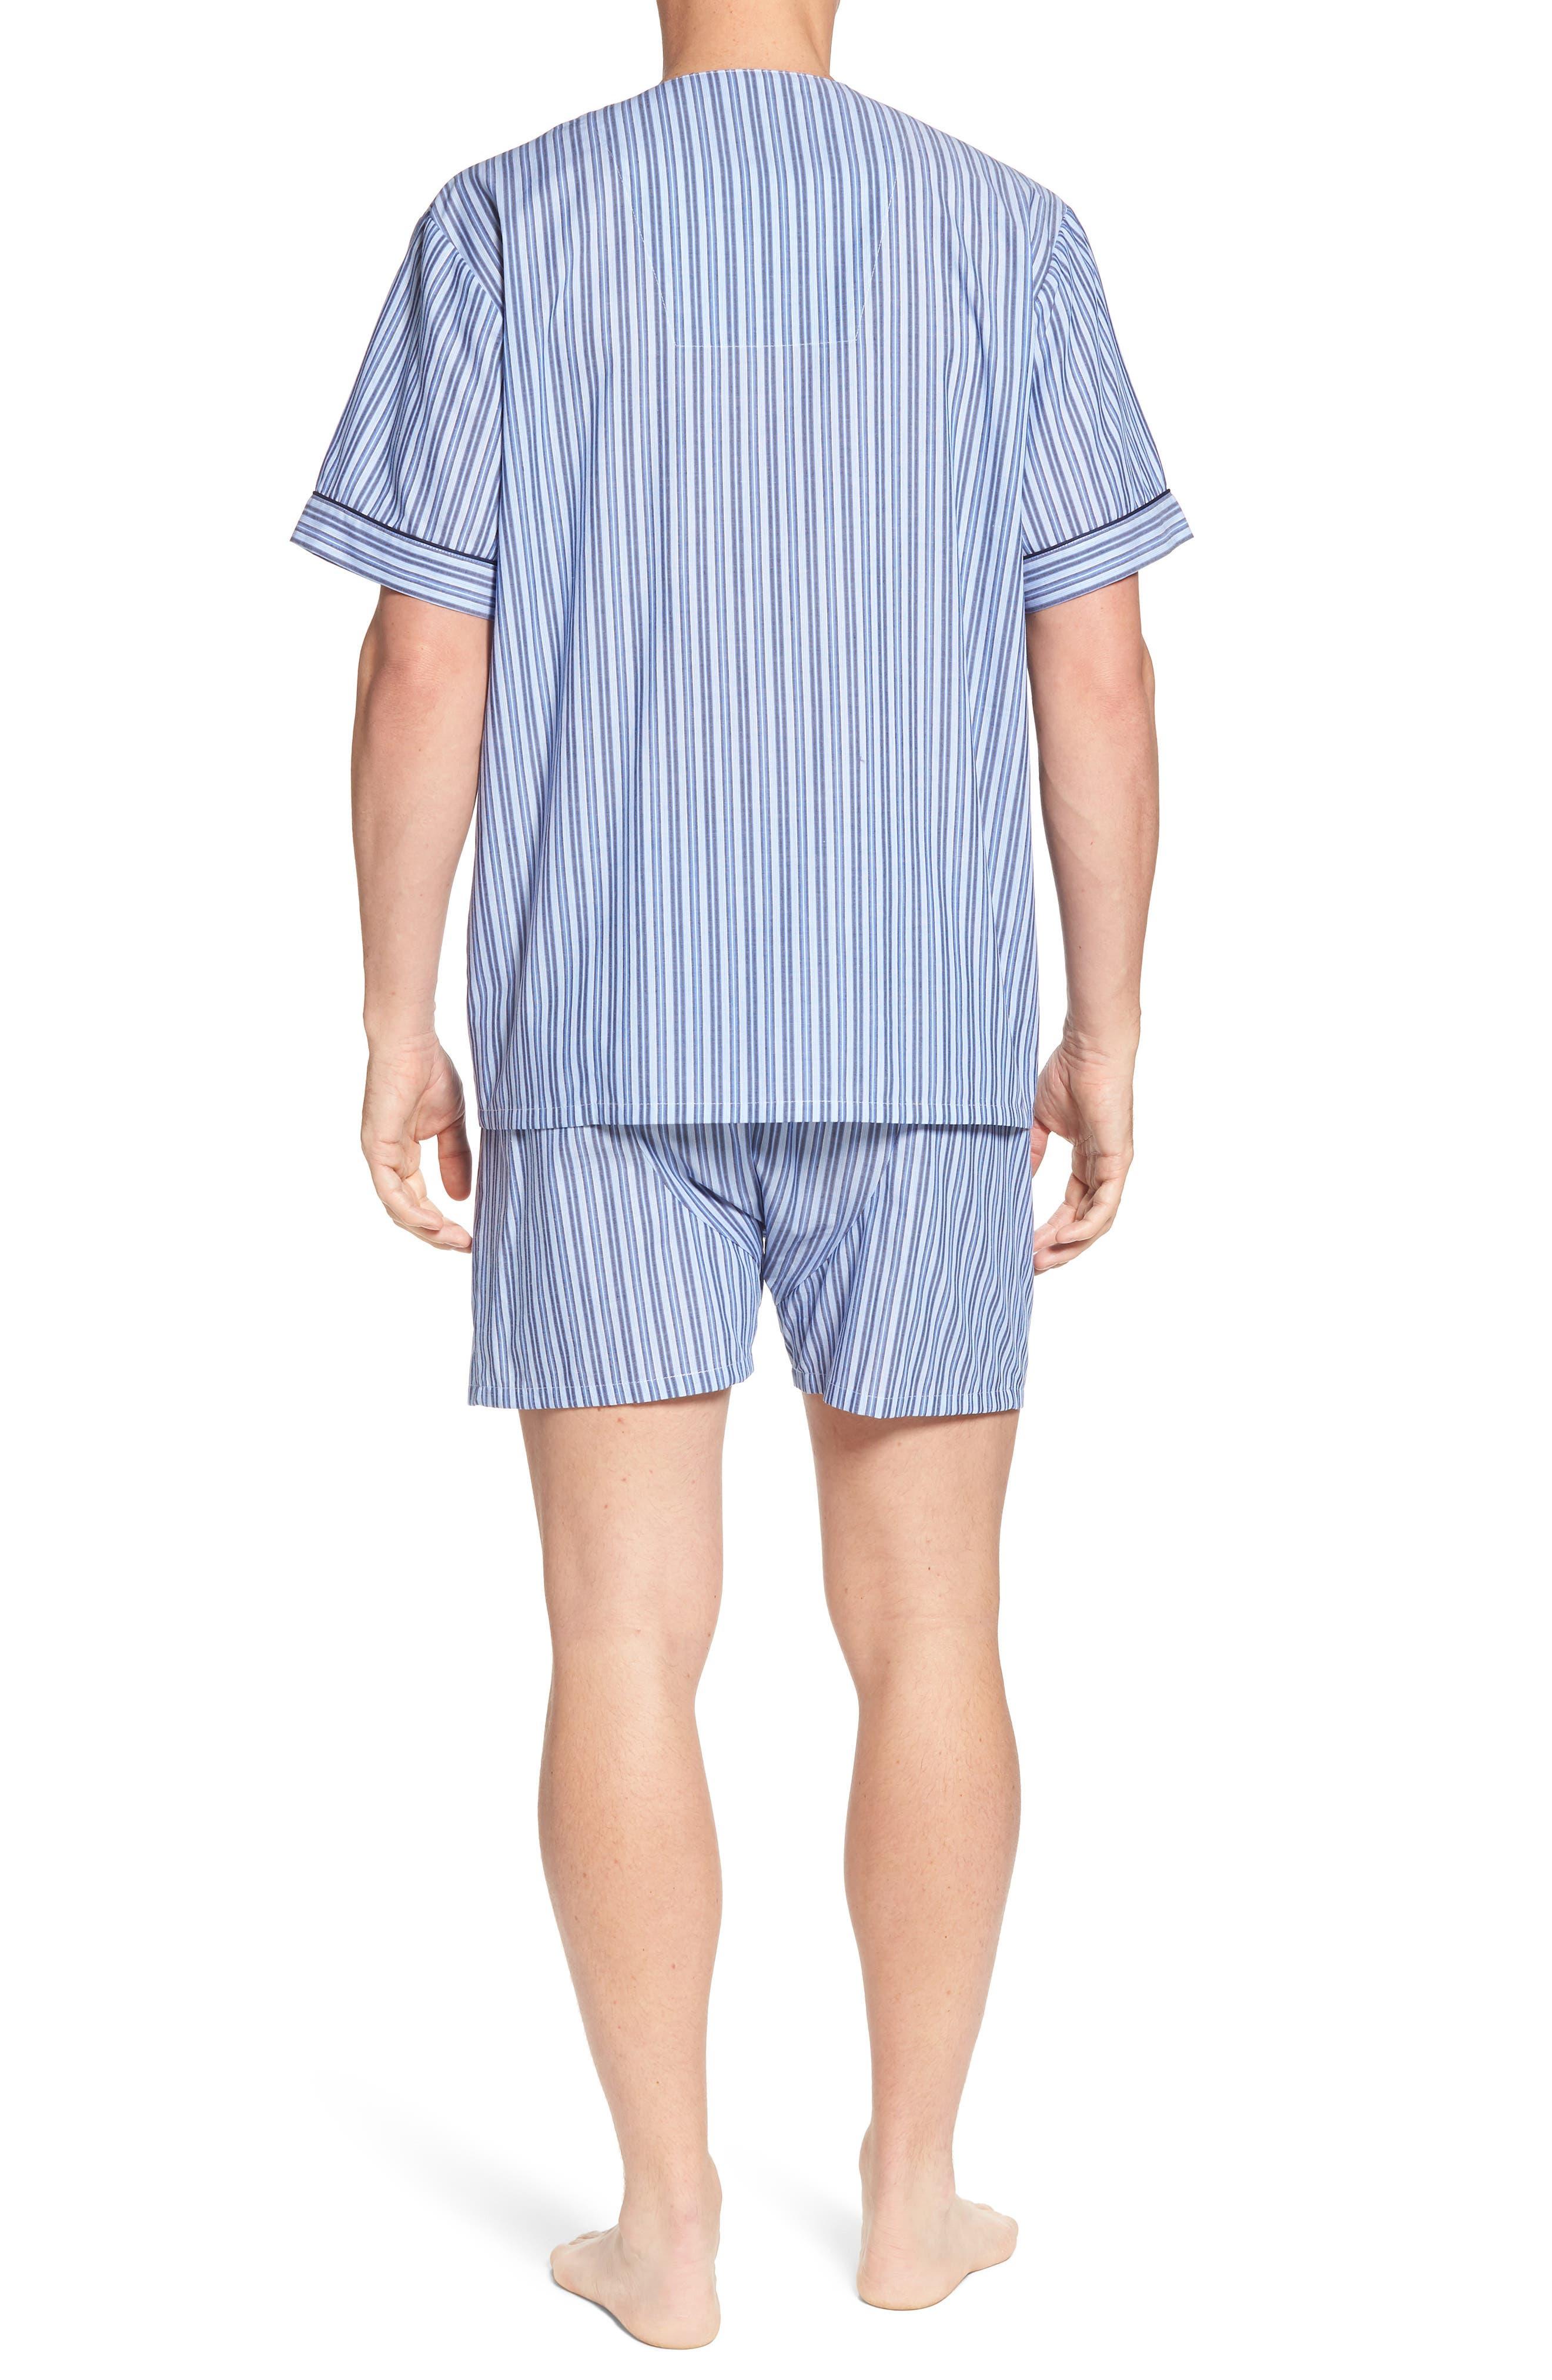 Carefree Shorty Pajama Set,                             Alternate thumbnail 2, color,                             BLUE STRIPE